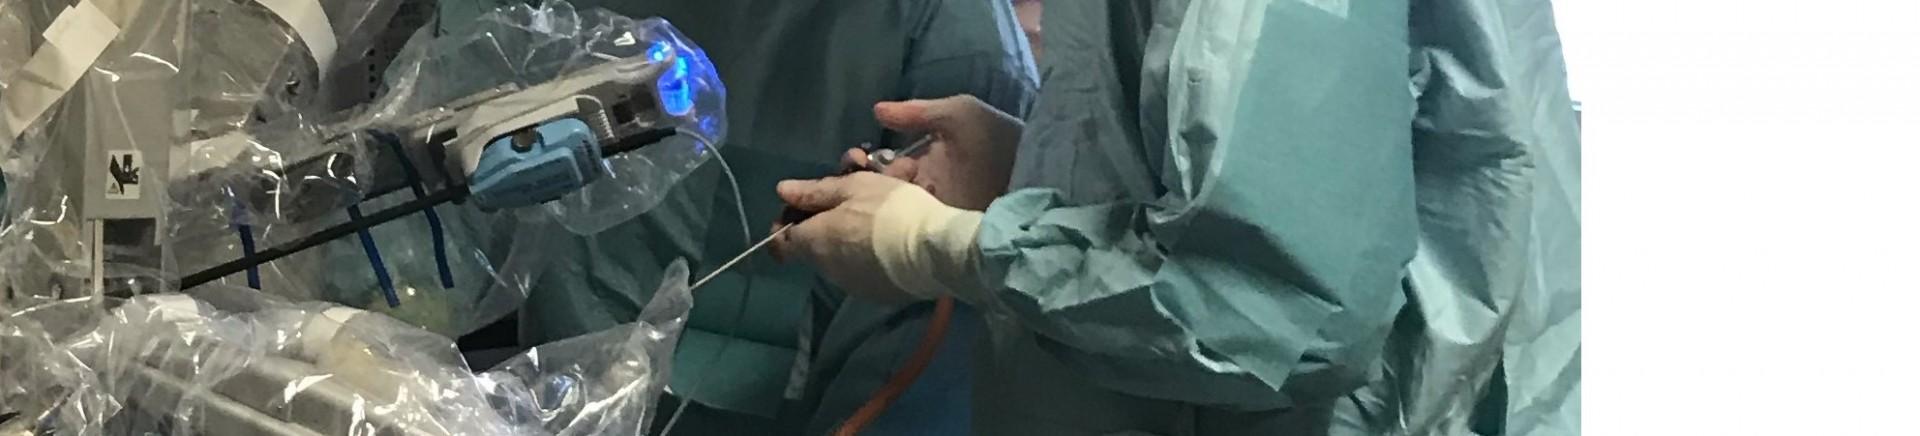 Operacje robotem DaVinci w Szpitalu EuroMediCare